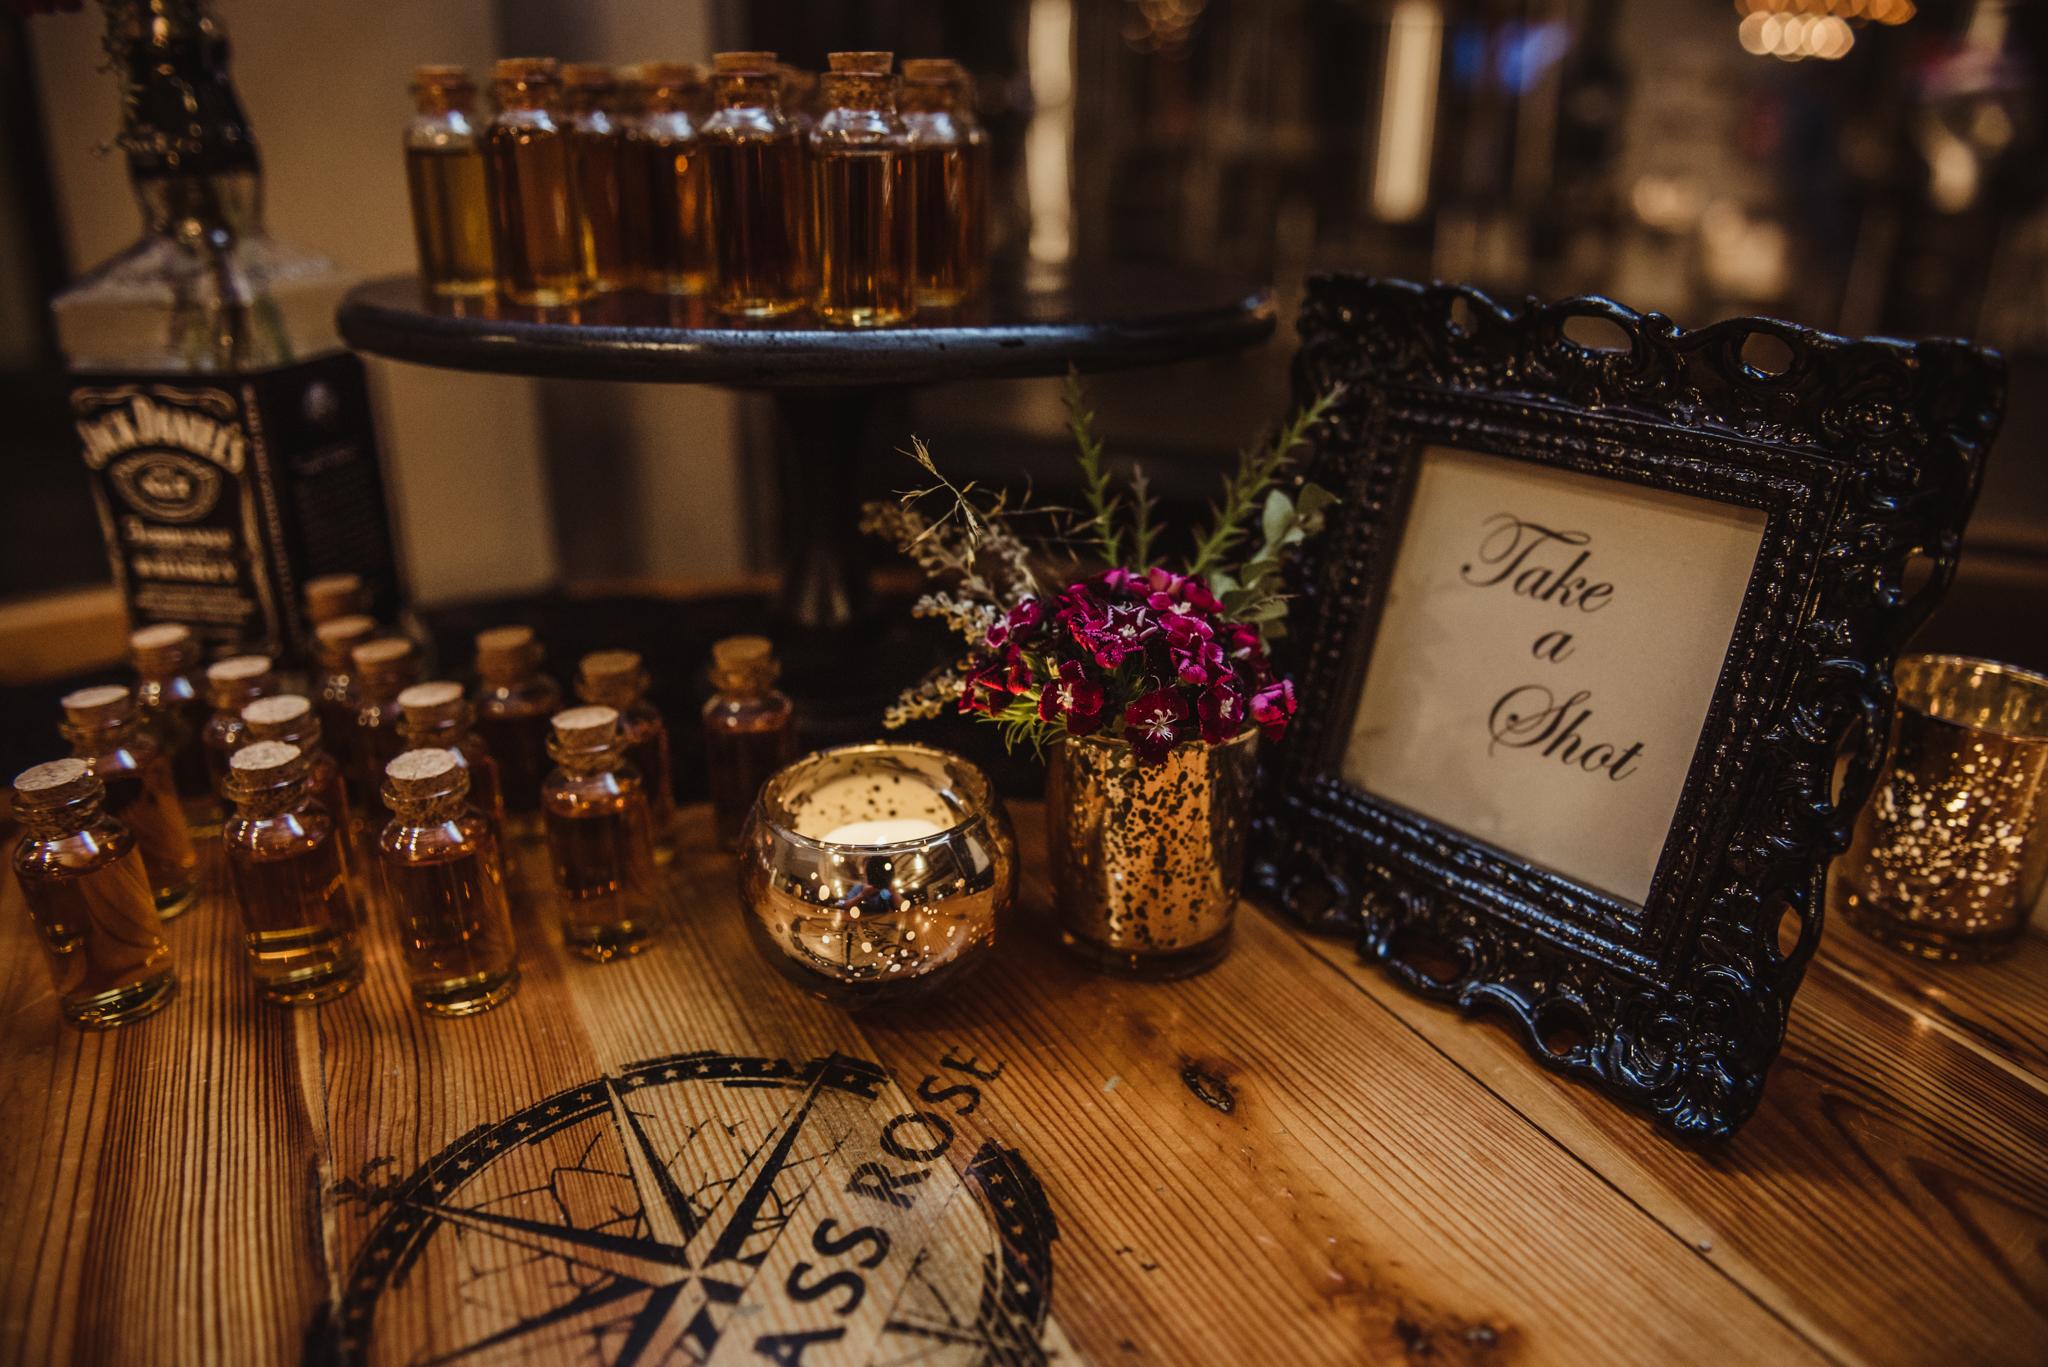 individual-shots-of-jack-daniels-as-wedding-favors.jpg